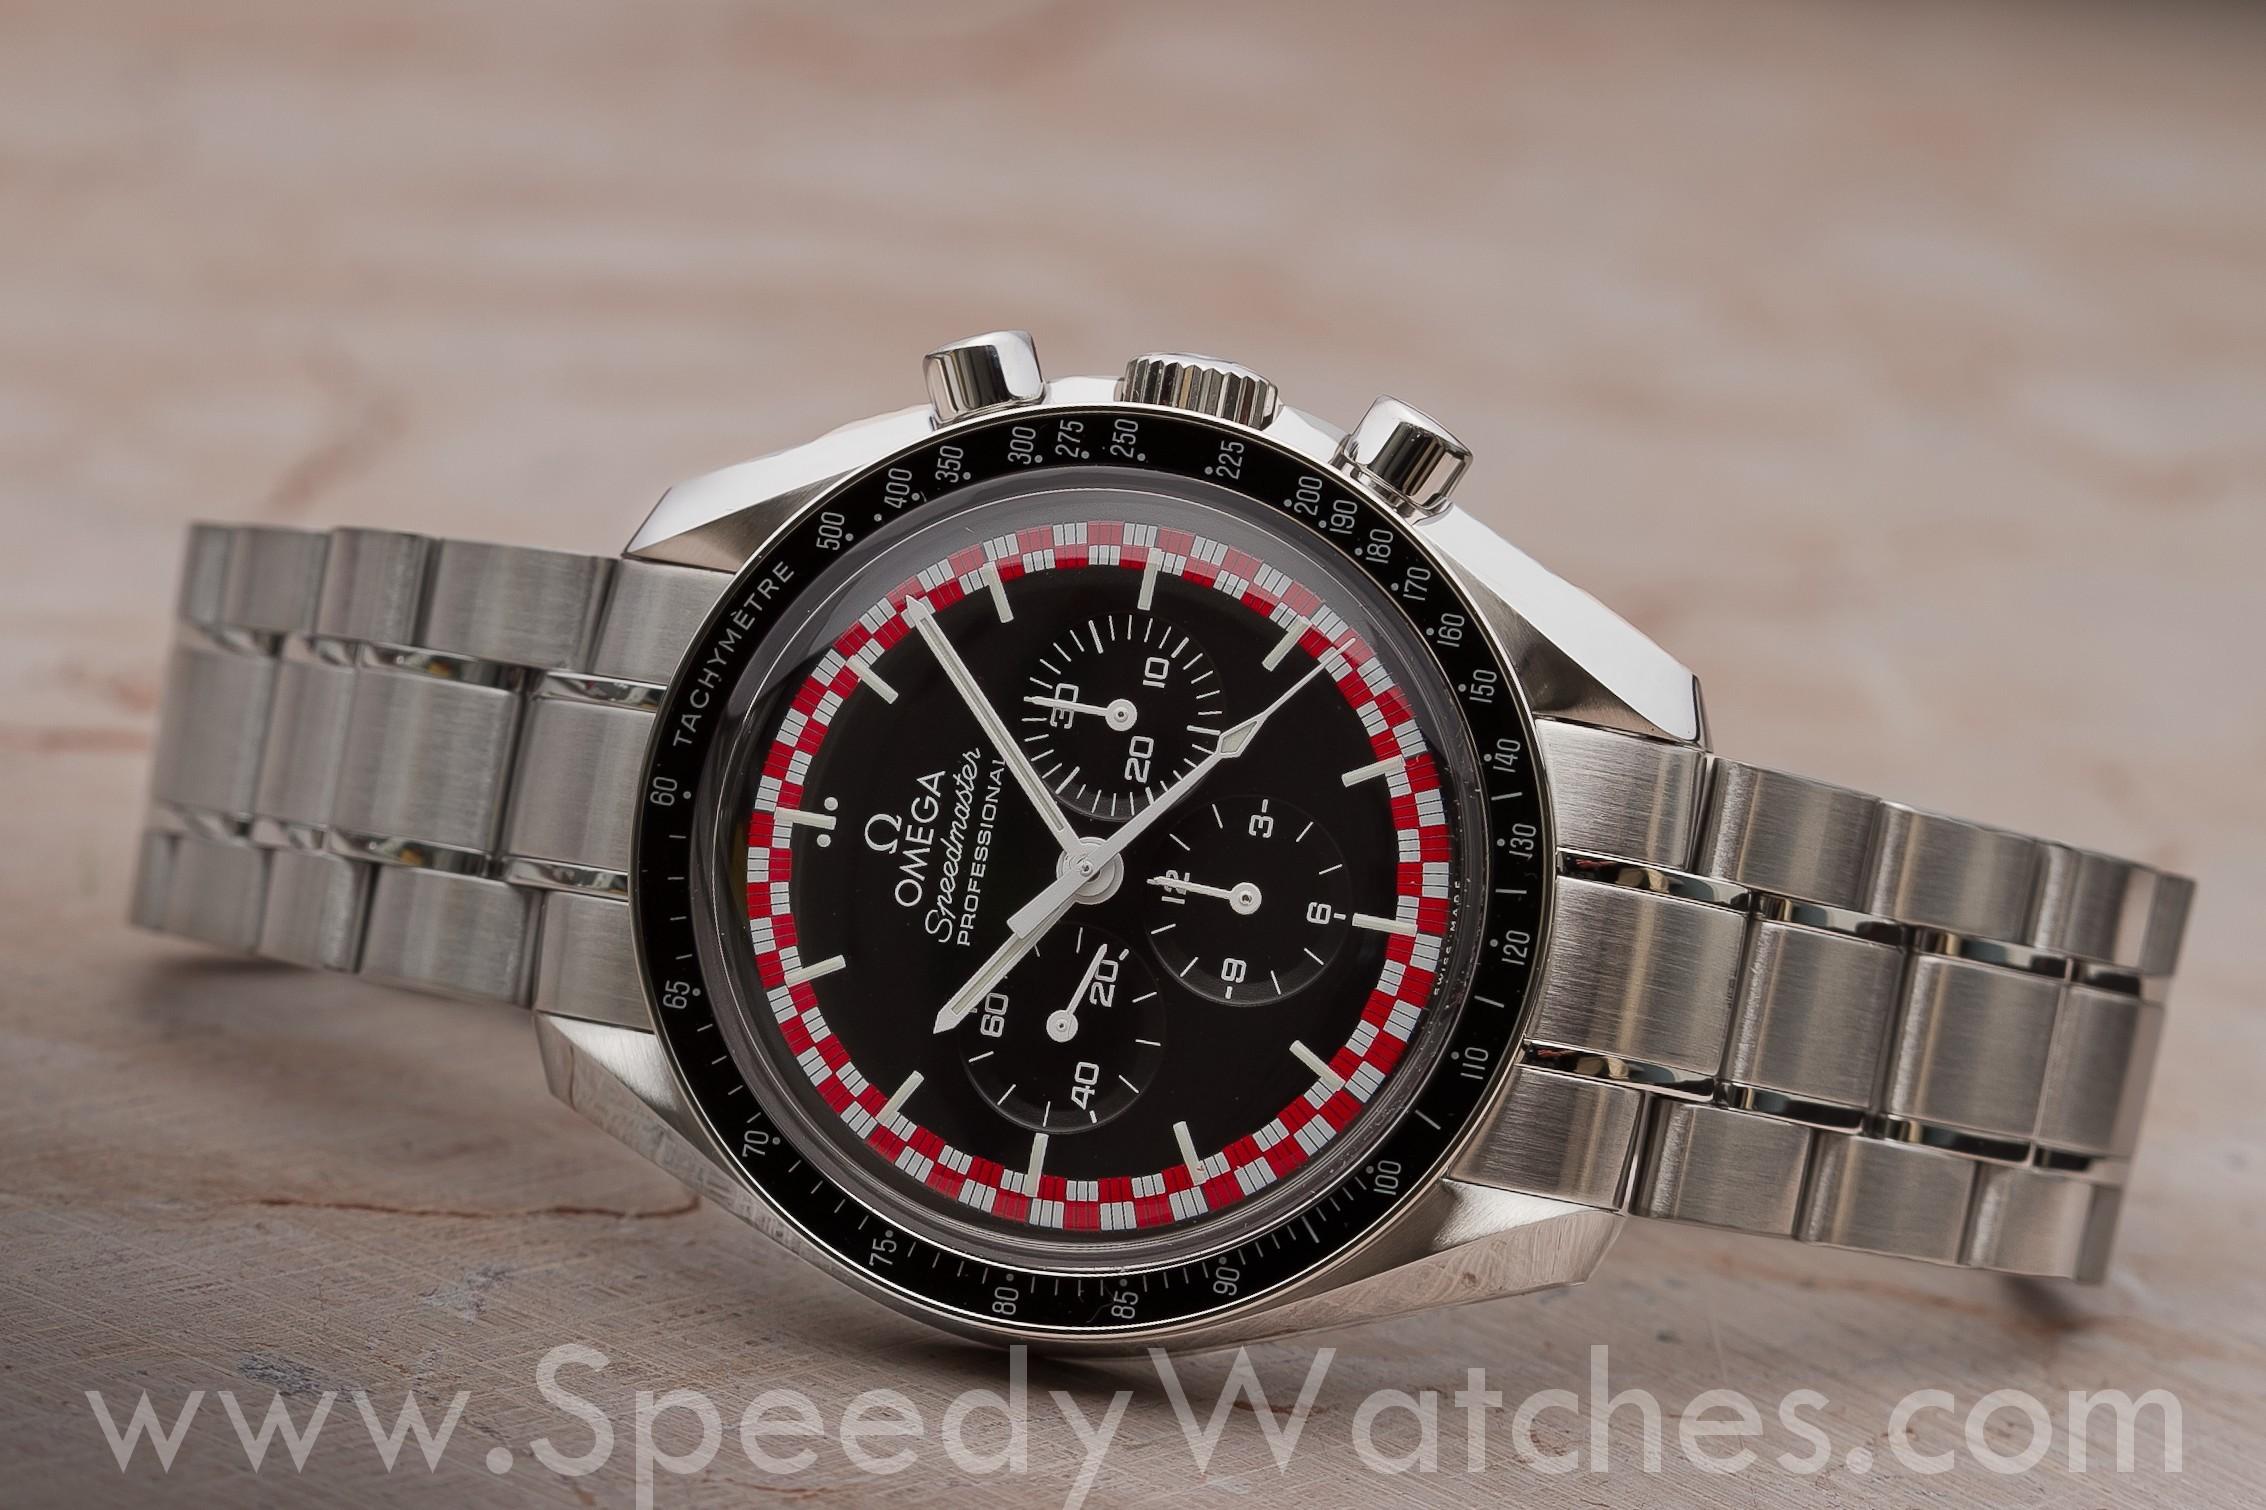 22e345144c5 Omega Speedmaster Professional 311.30.42.30.01.004 Racing   TinTin